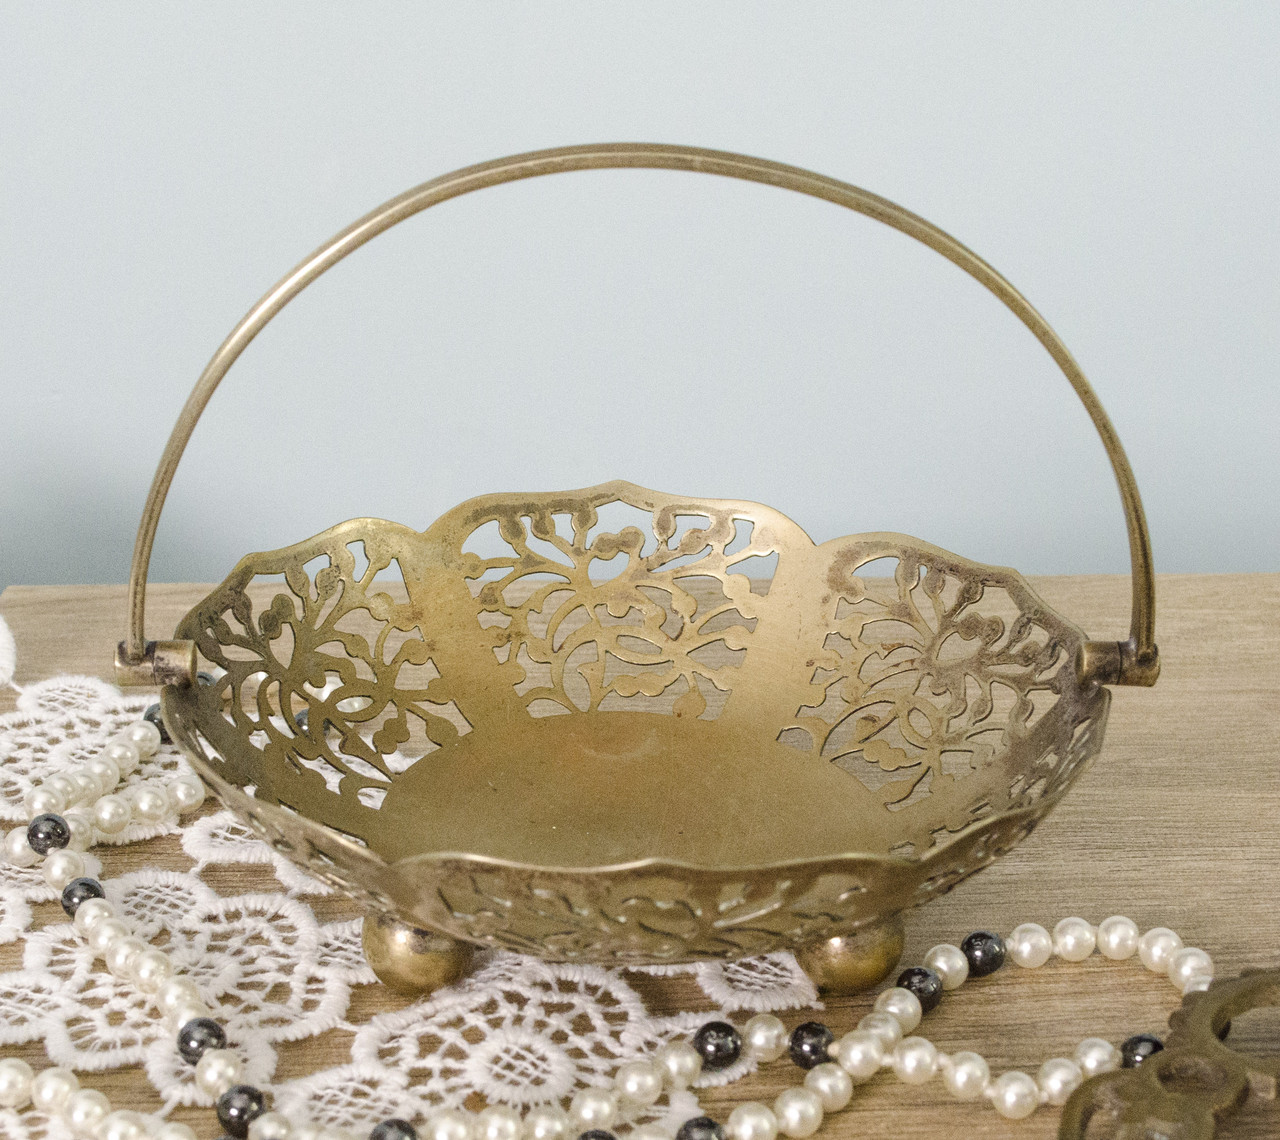 Ажурная бронзовая ваза для конфет, конфетница, бронза, Англия